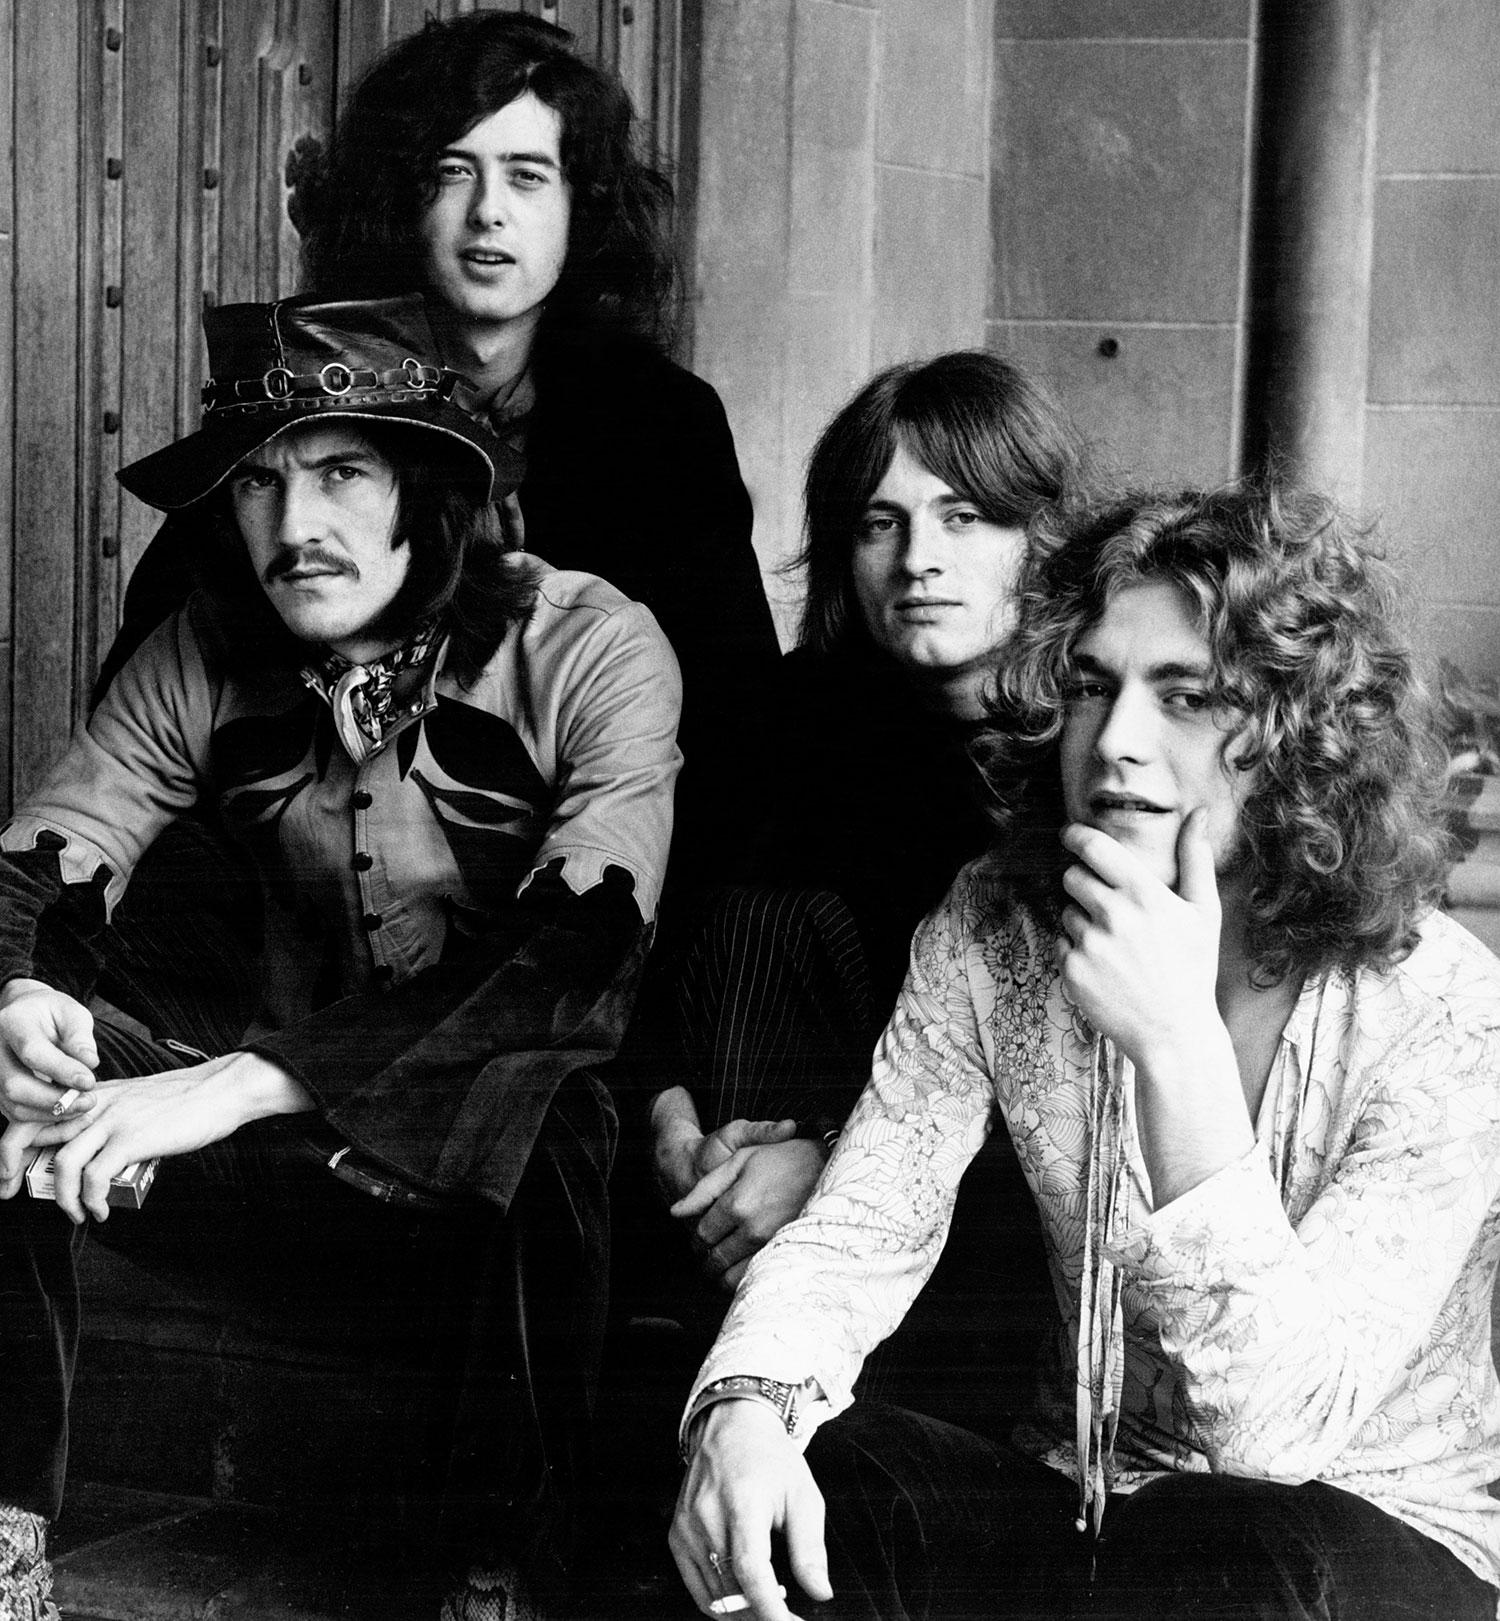 df44725e Led Zeppelin III': How Band Embraced Trippy Folk Side – Rolling Stone